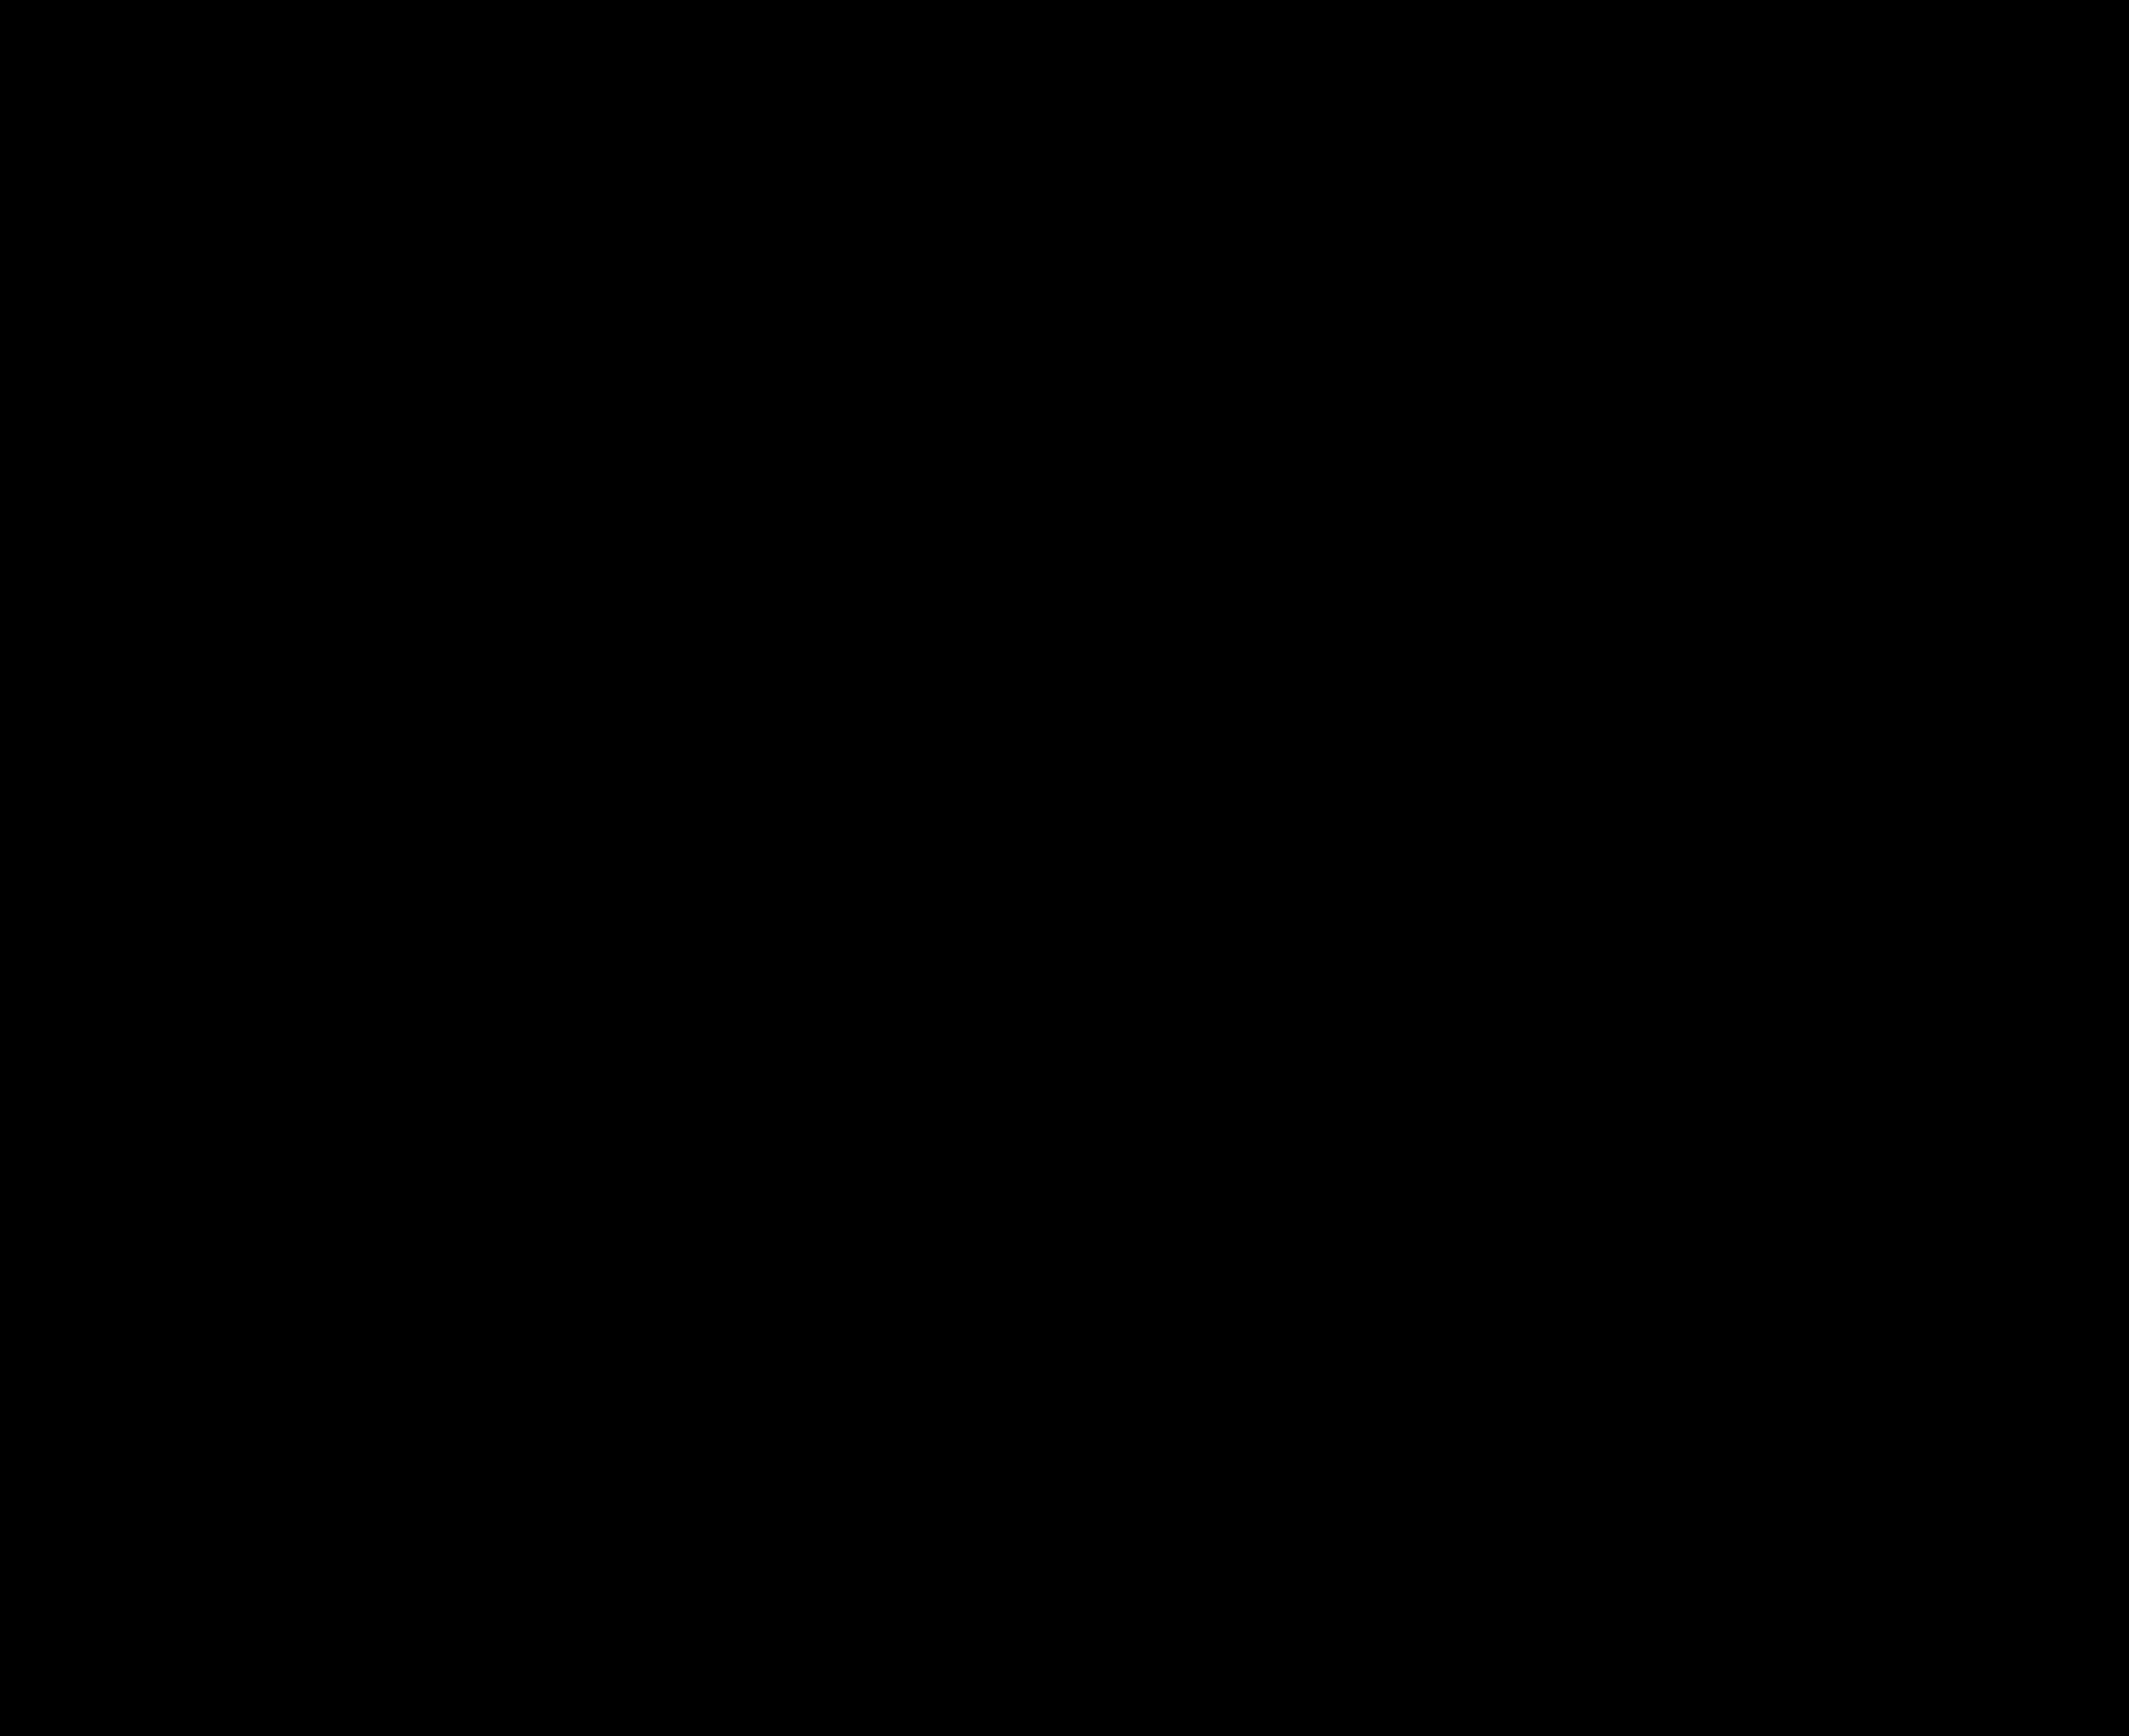 Polished-logoBW2.png